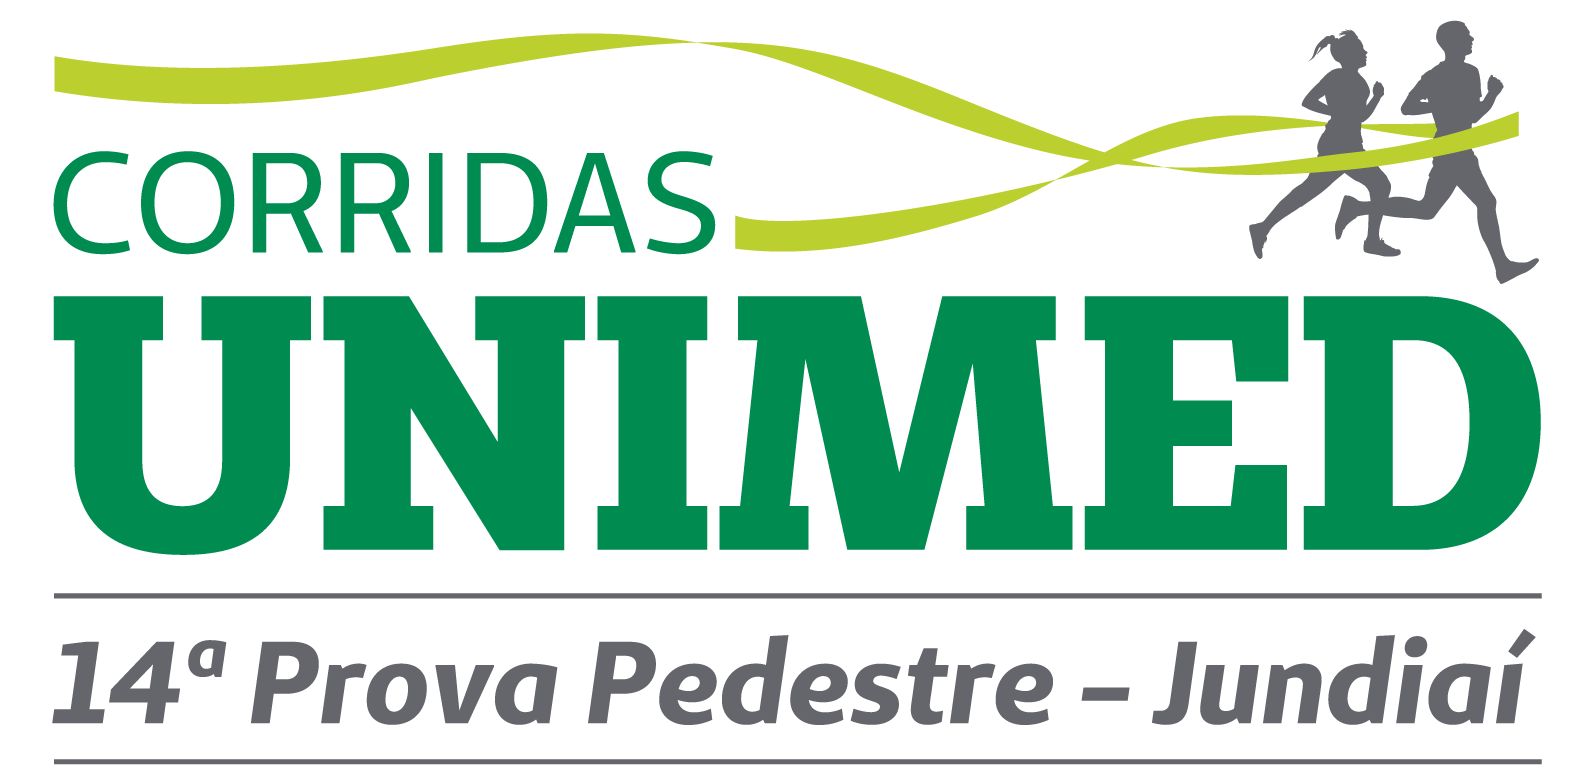 14ª Prova Pedestre e 3ª KIDS RUN-  Unimed Jundiai - Imagem de topo